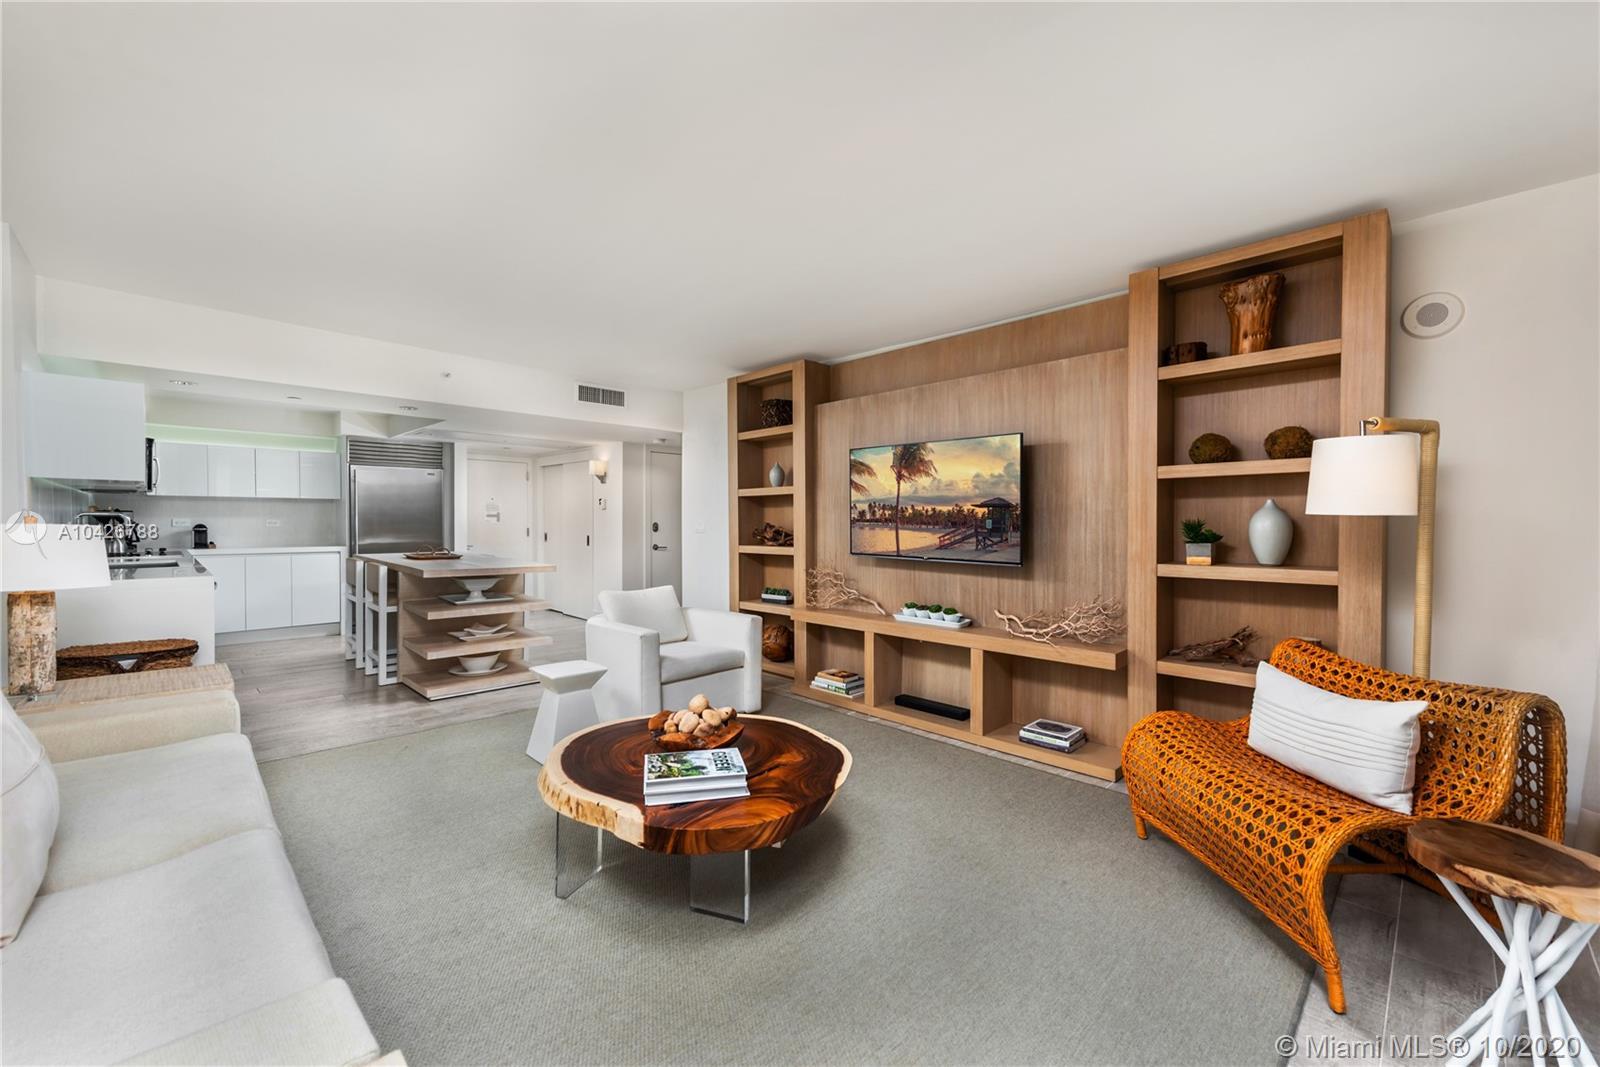 1 Hotel & Homes #1208 - 102 24th St #1208, Miami Beach, FL 33139